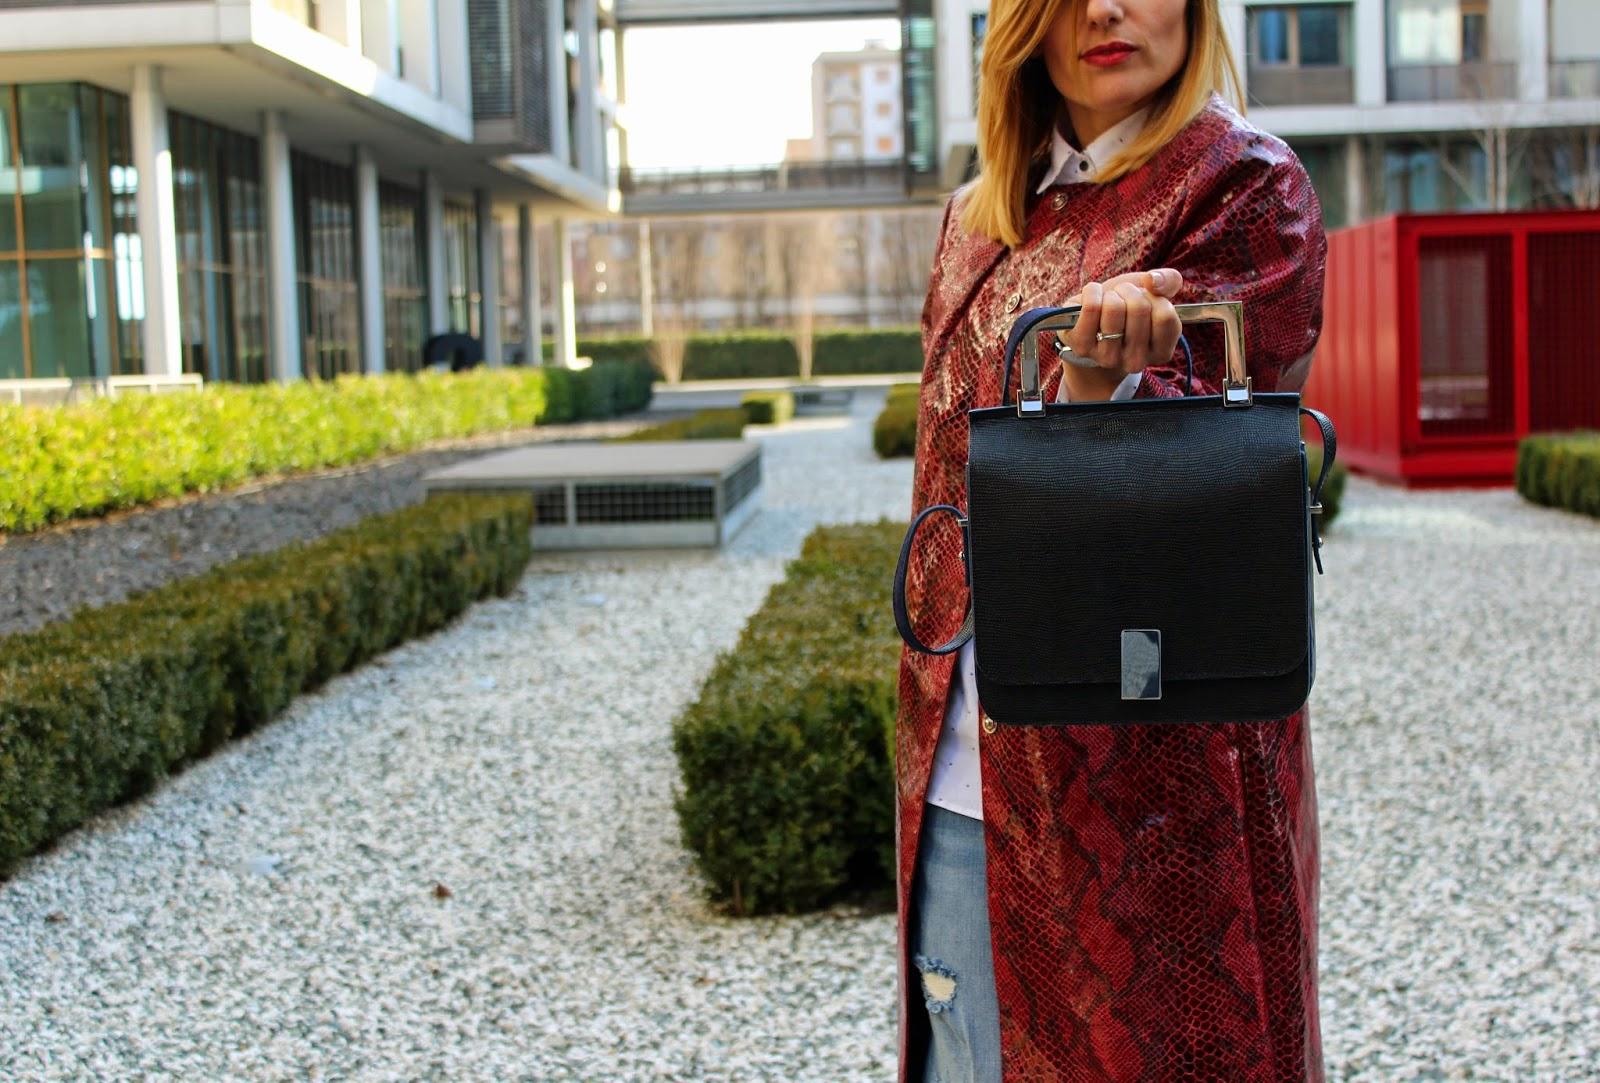 Eniwhere Fashion - Pignarea - Milan Fashion Week